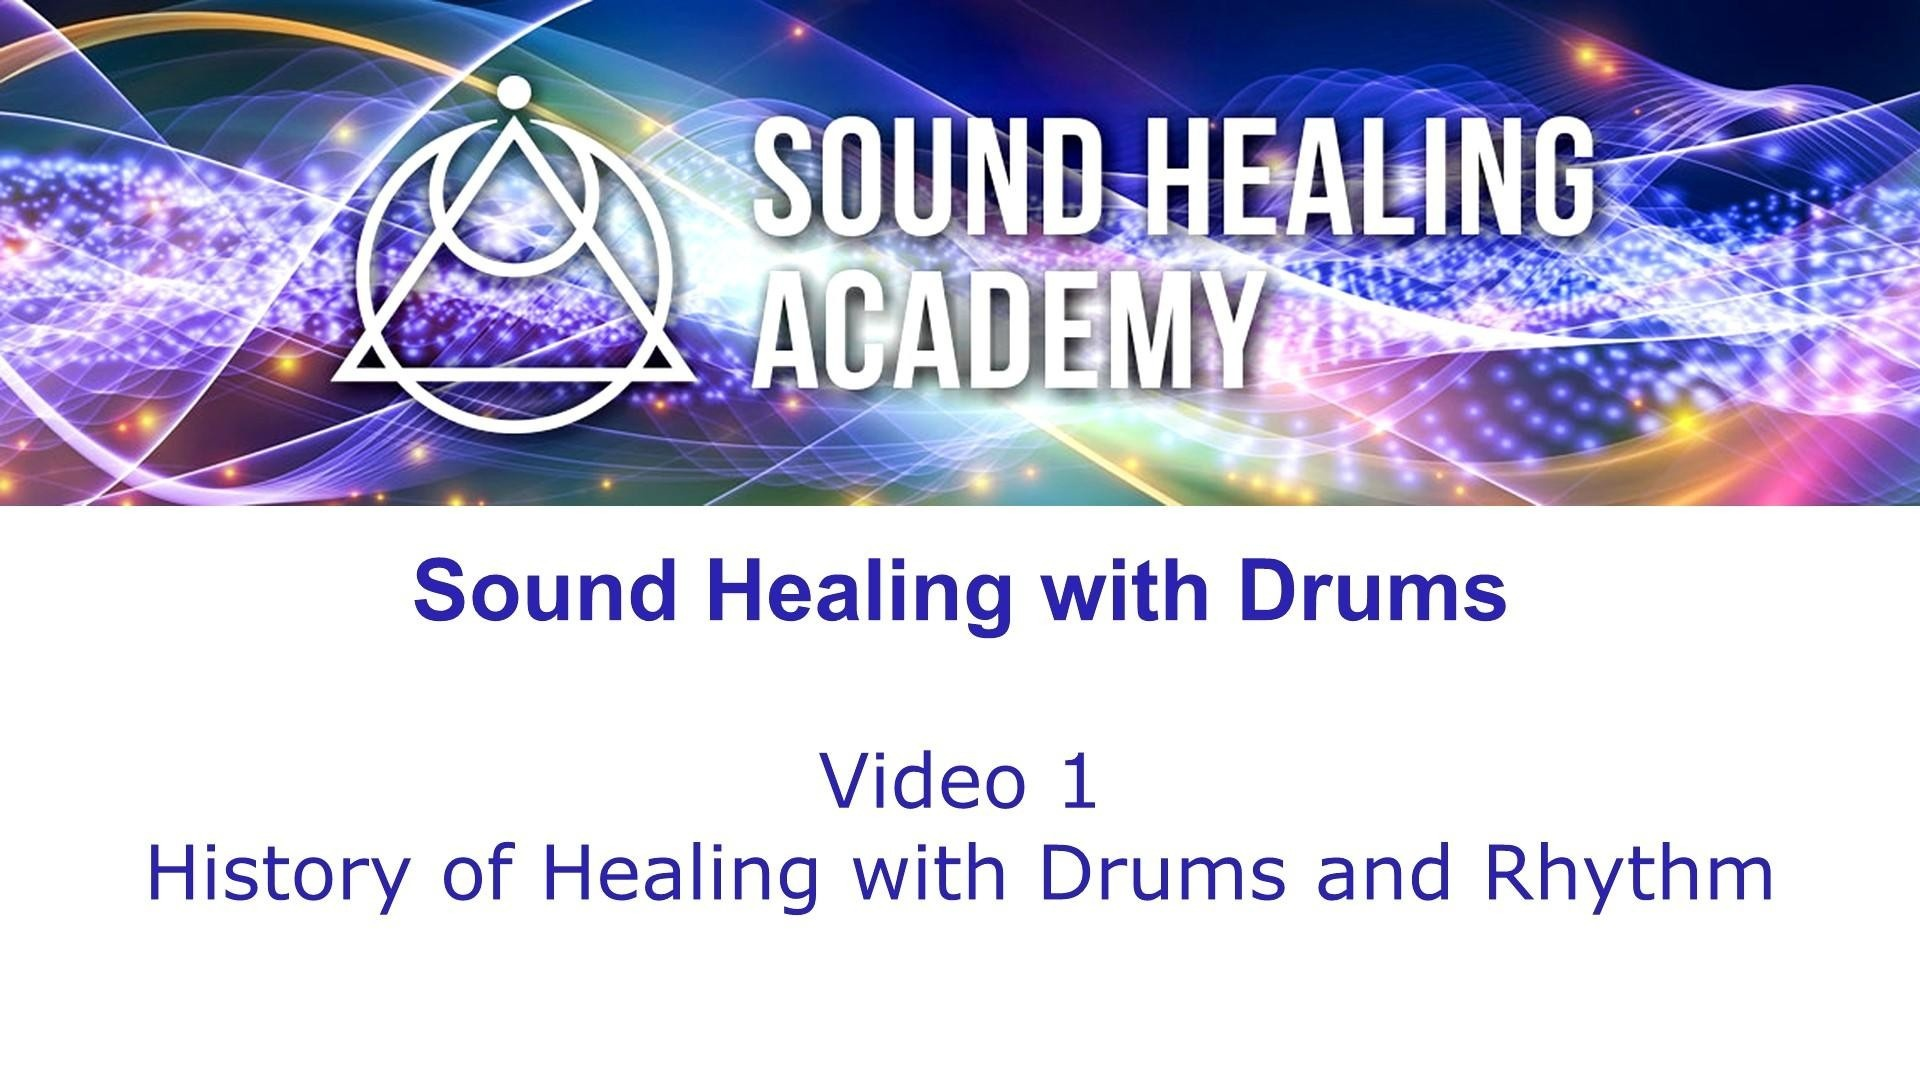 Drums Module 1